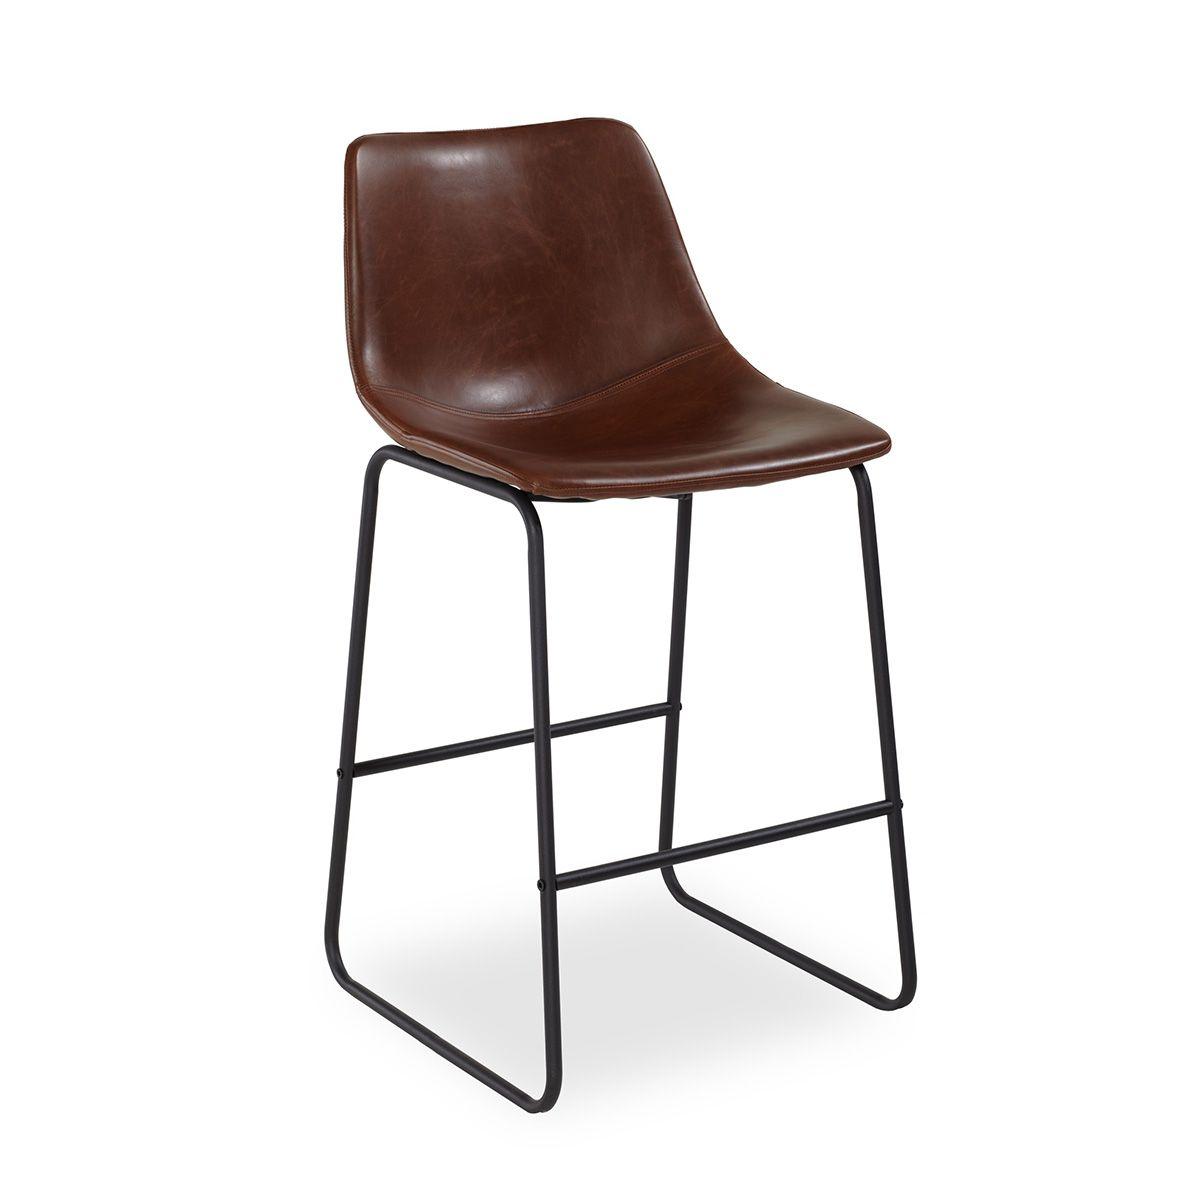 Барный стул Vermut тёмно-коричневыйБарные стулья<br><br>